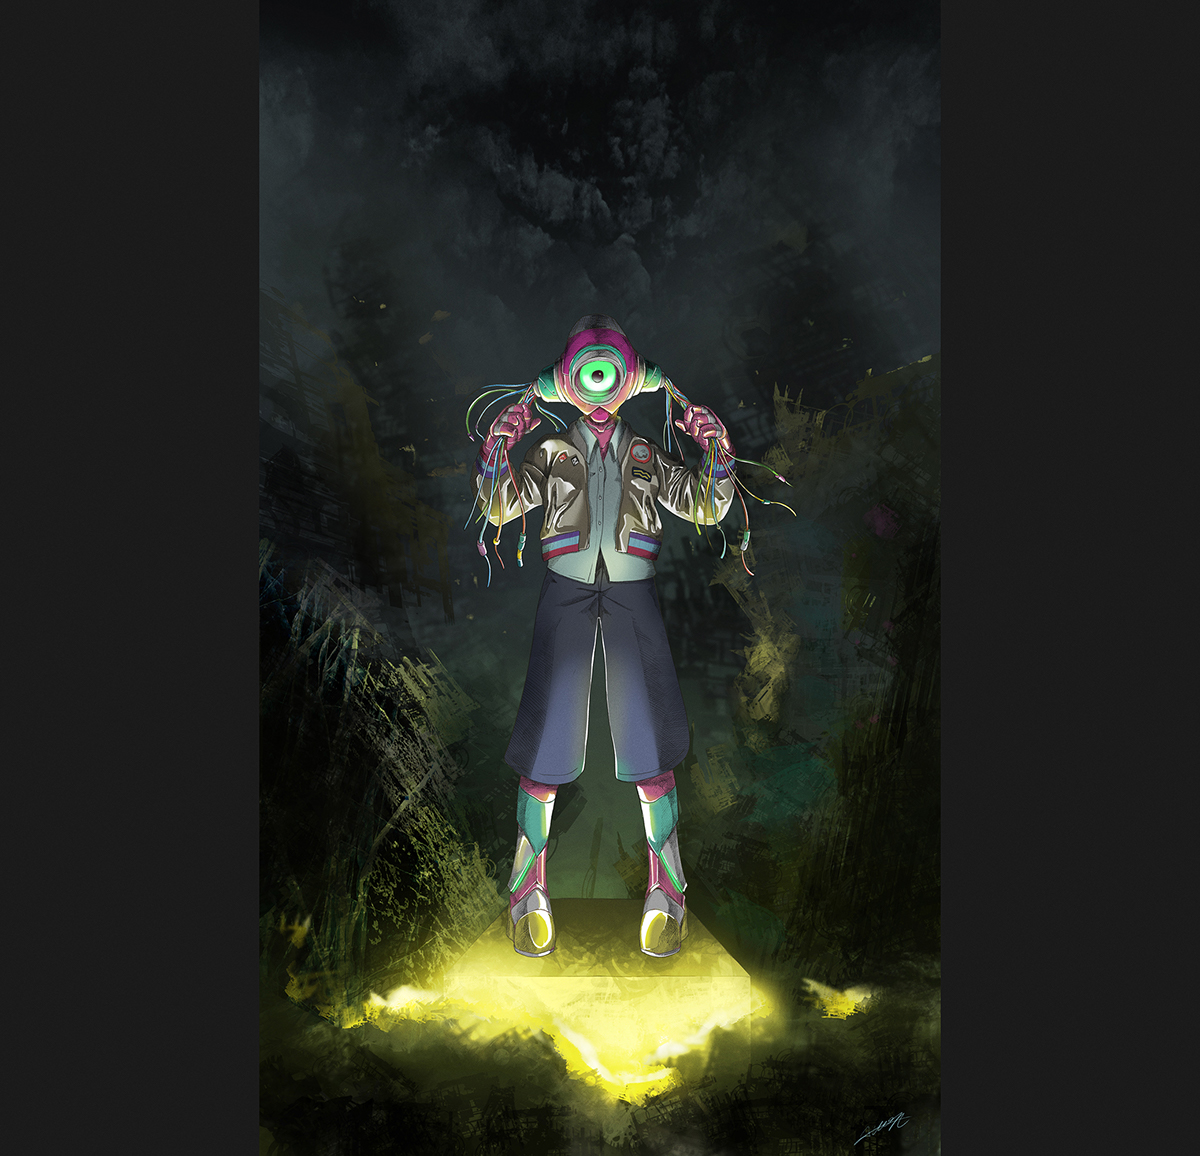 hope robot apocalypse jacket Diesel lights ruins Fashion  machine girl